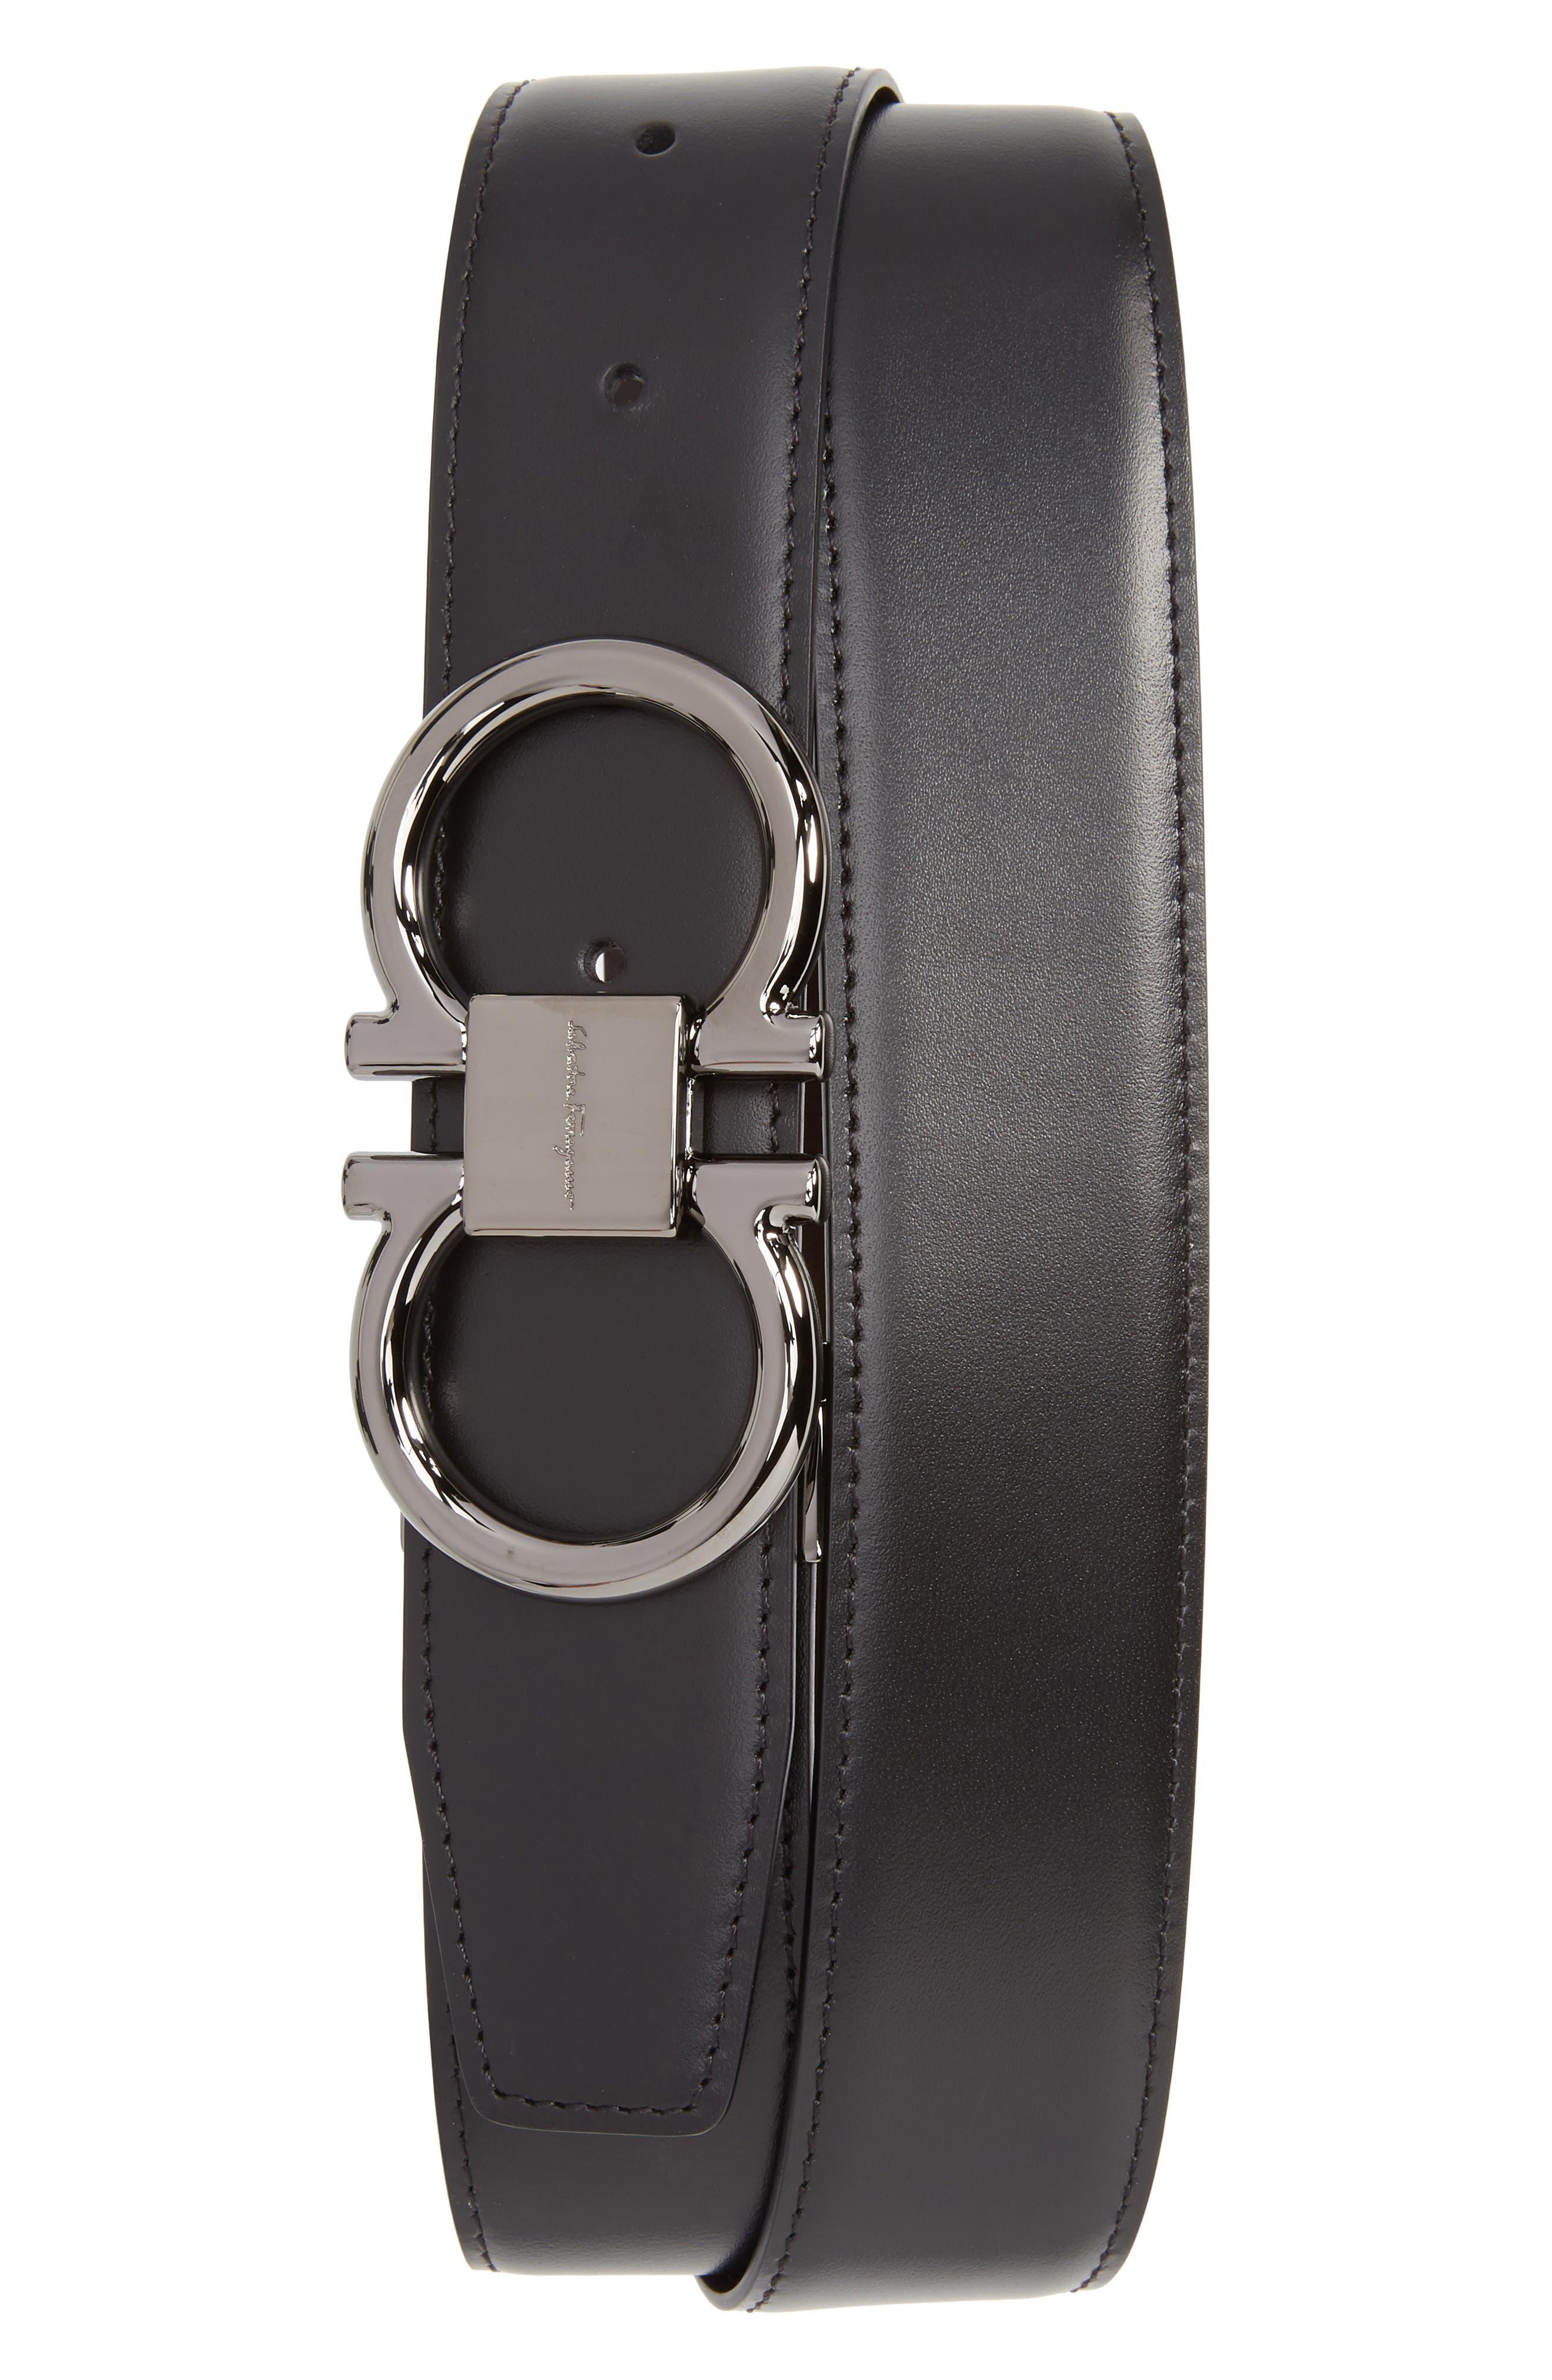 SALVATORE FERRAGAMO, Gancio Reversible Calfskin Leather Belt, Main thumbnail 1, color, BLACK/ HICKORY